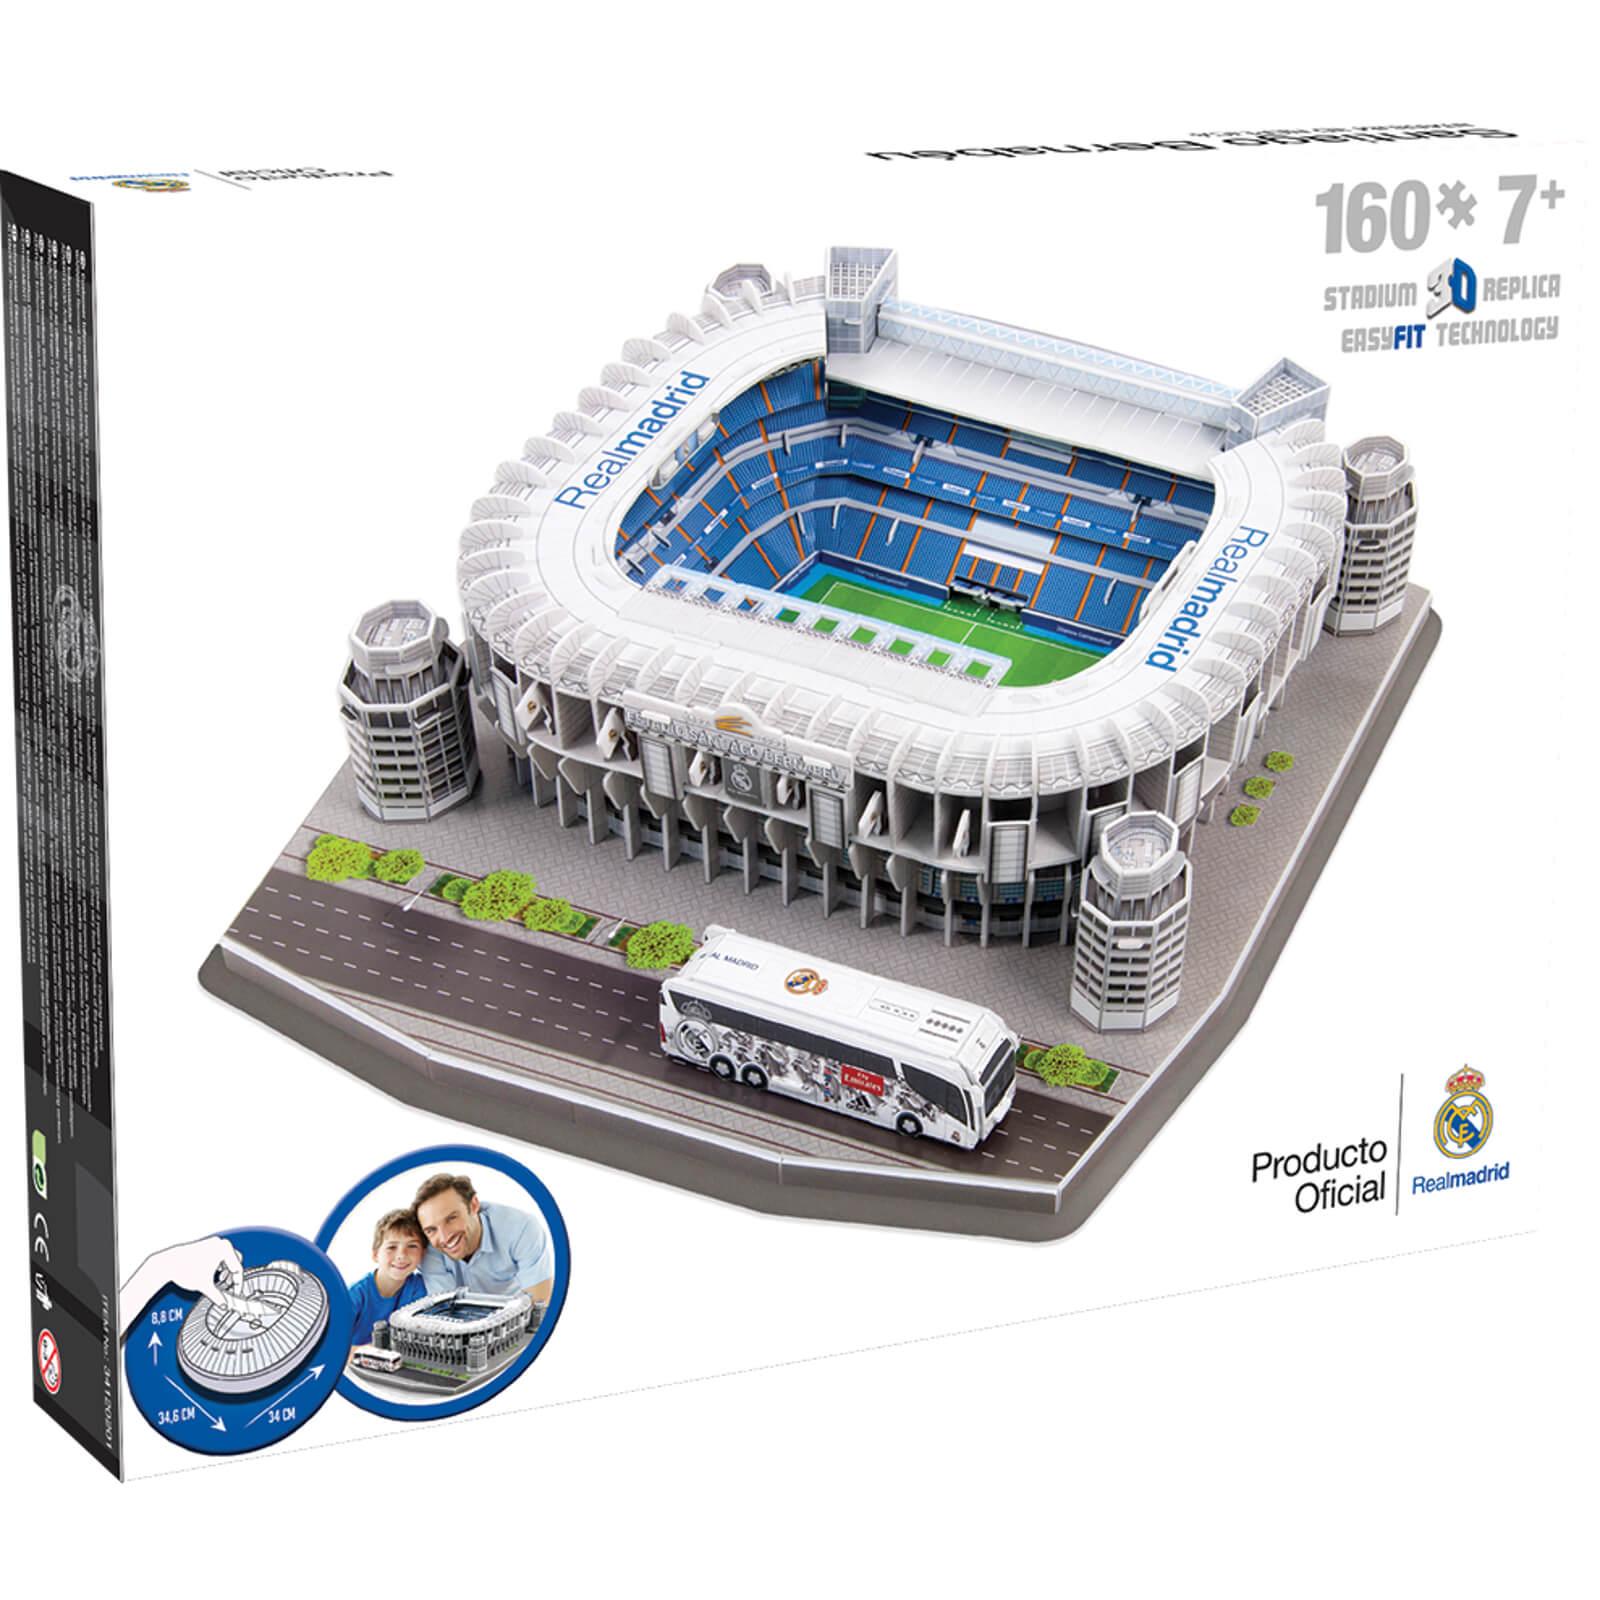 Image of 3D Puzzle Football Stadium - Santiago Bernabeu